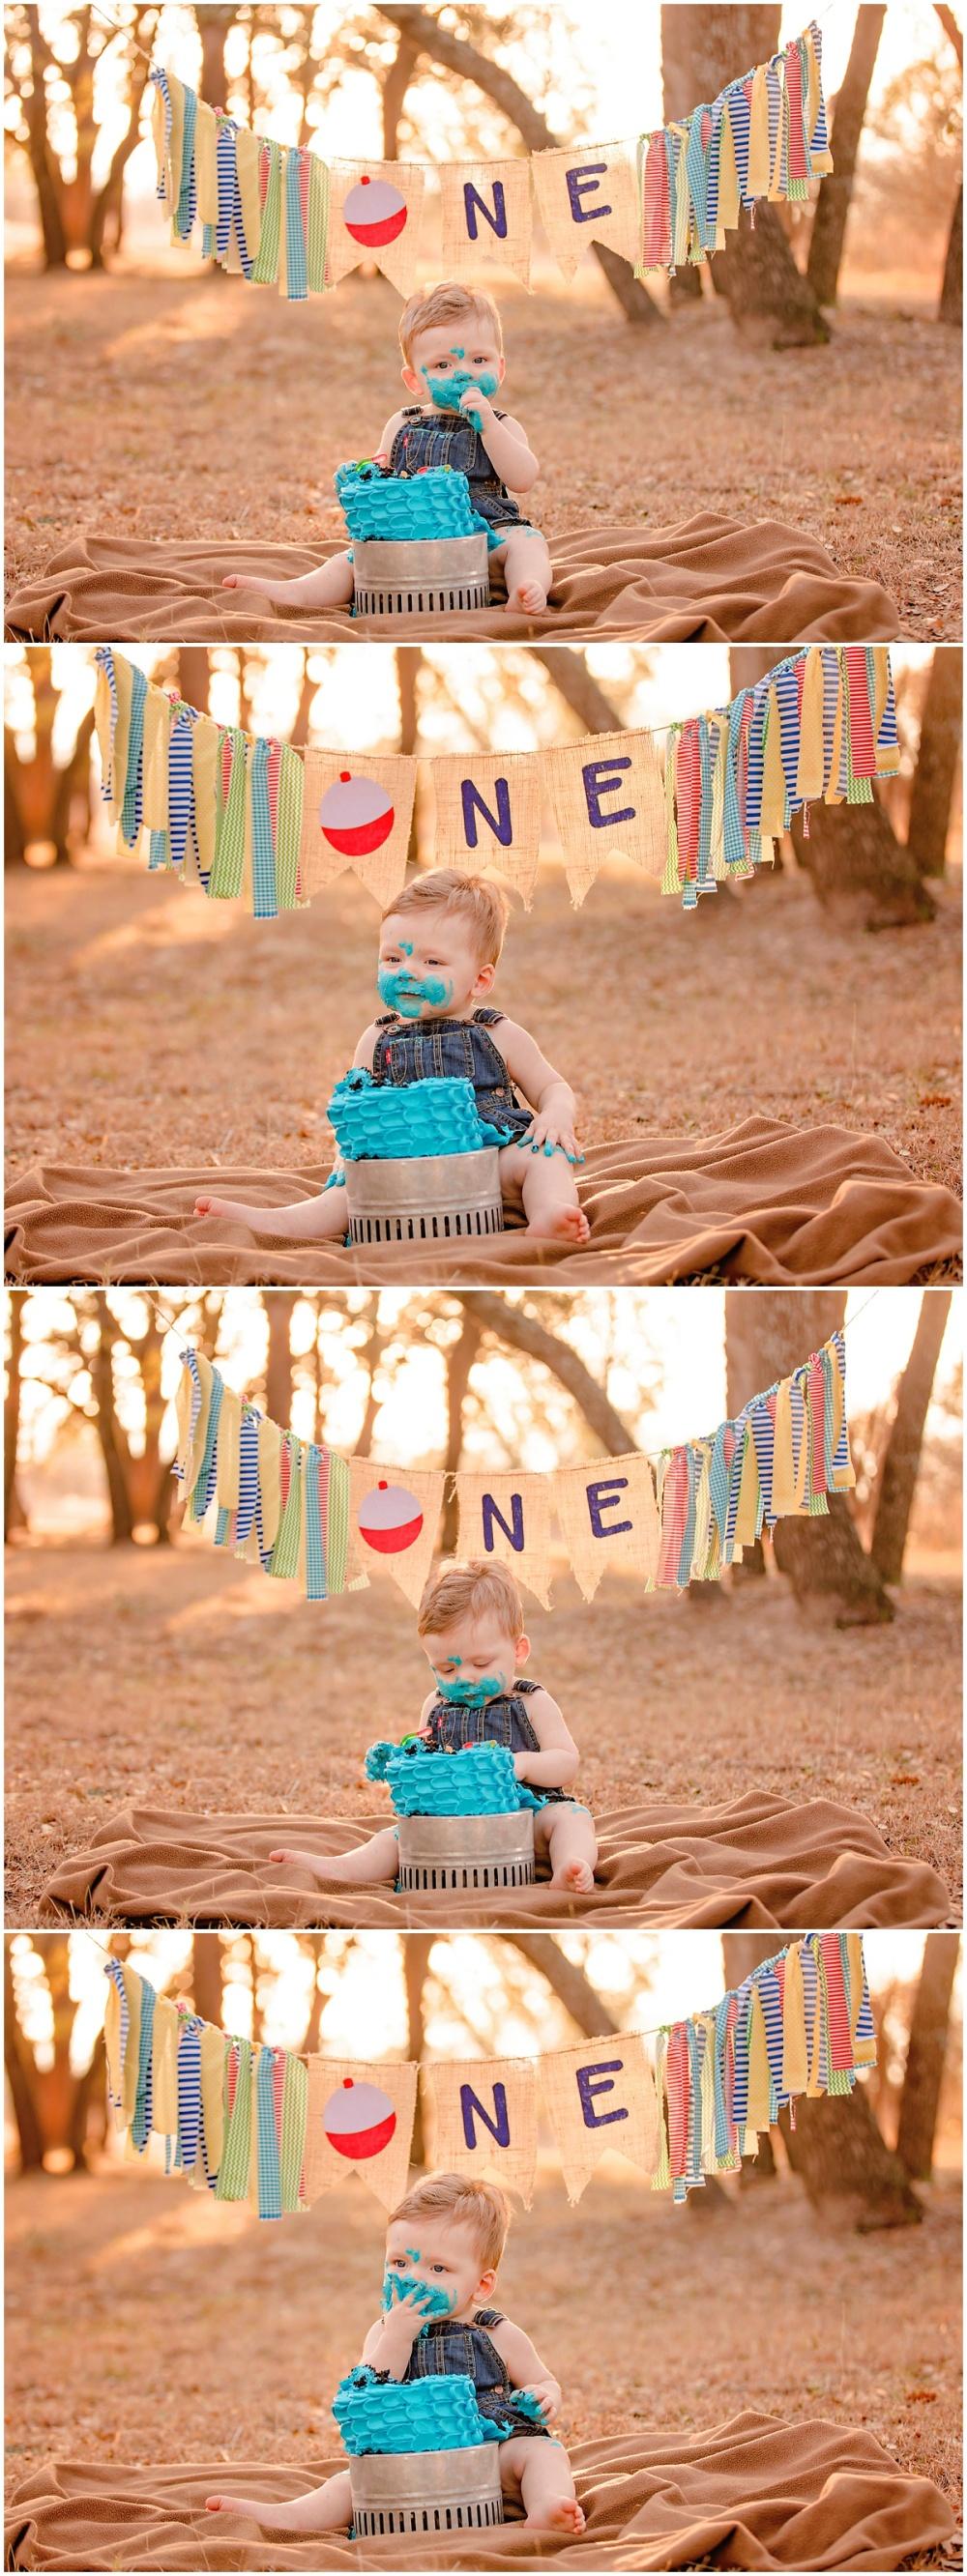 Family-Children-Maternity-Portraits-San-Antonio-Hill-Country-Texas-Carly-Barton-Photography_0116.jpg